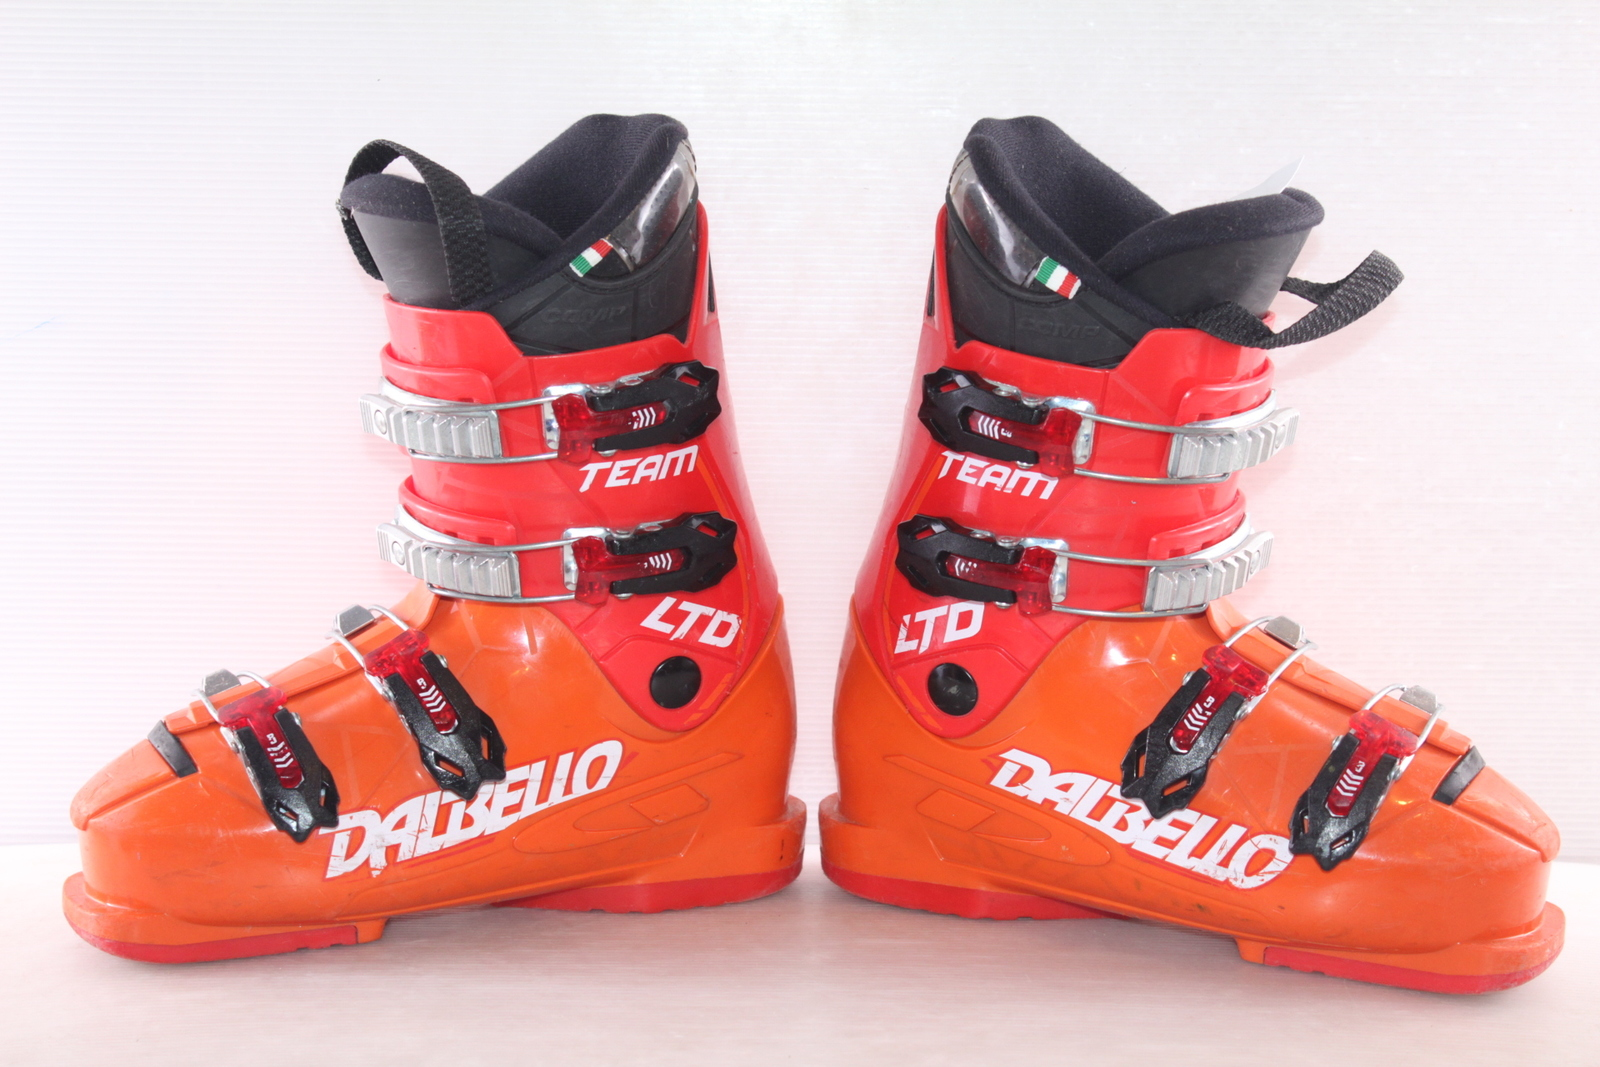 Dětské lyžáky Dalbello Team Ltd vel. EU36.5